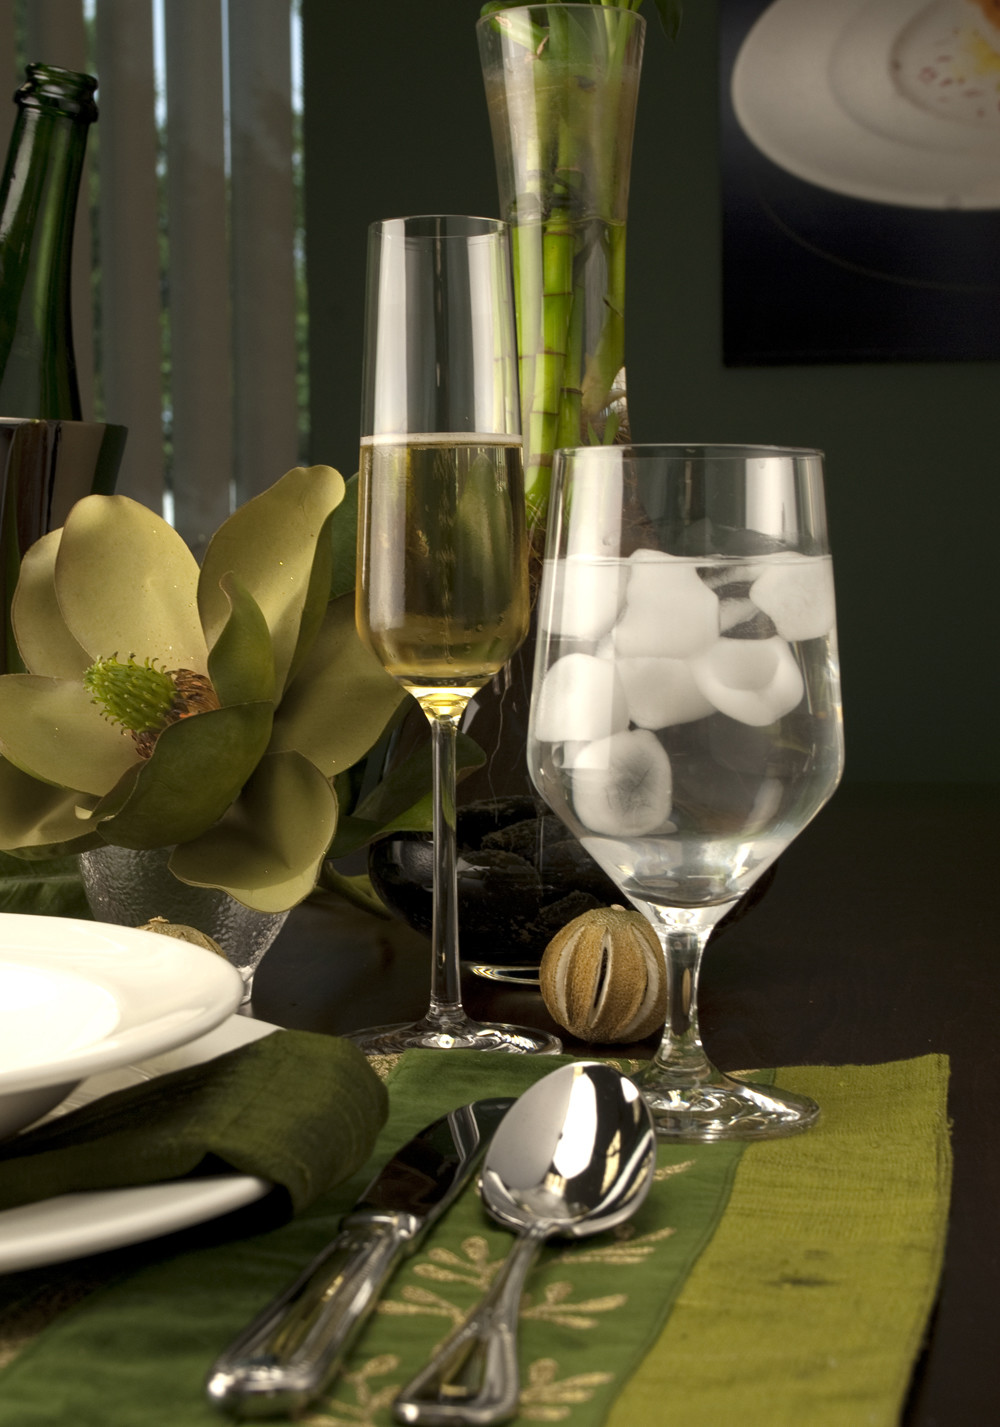 Набор бокалов для воды Schott Zwiesel PURE, объем 0,451 л, прозрачный,  6 штук Schott Zwiesel 112842_6шт фото 3